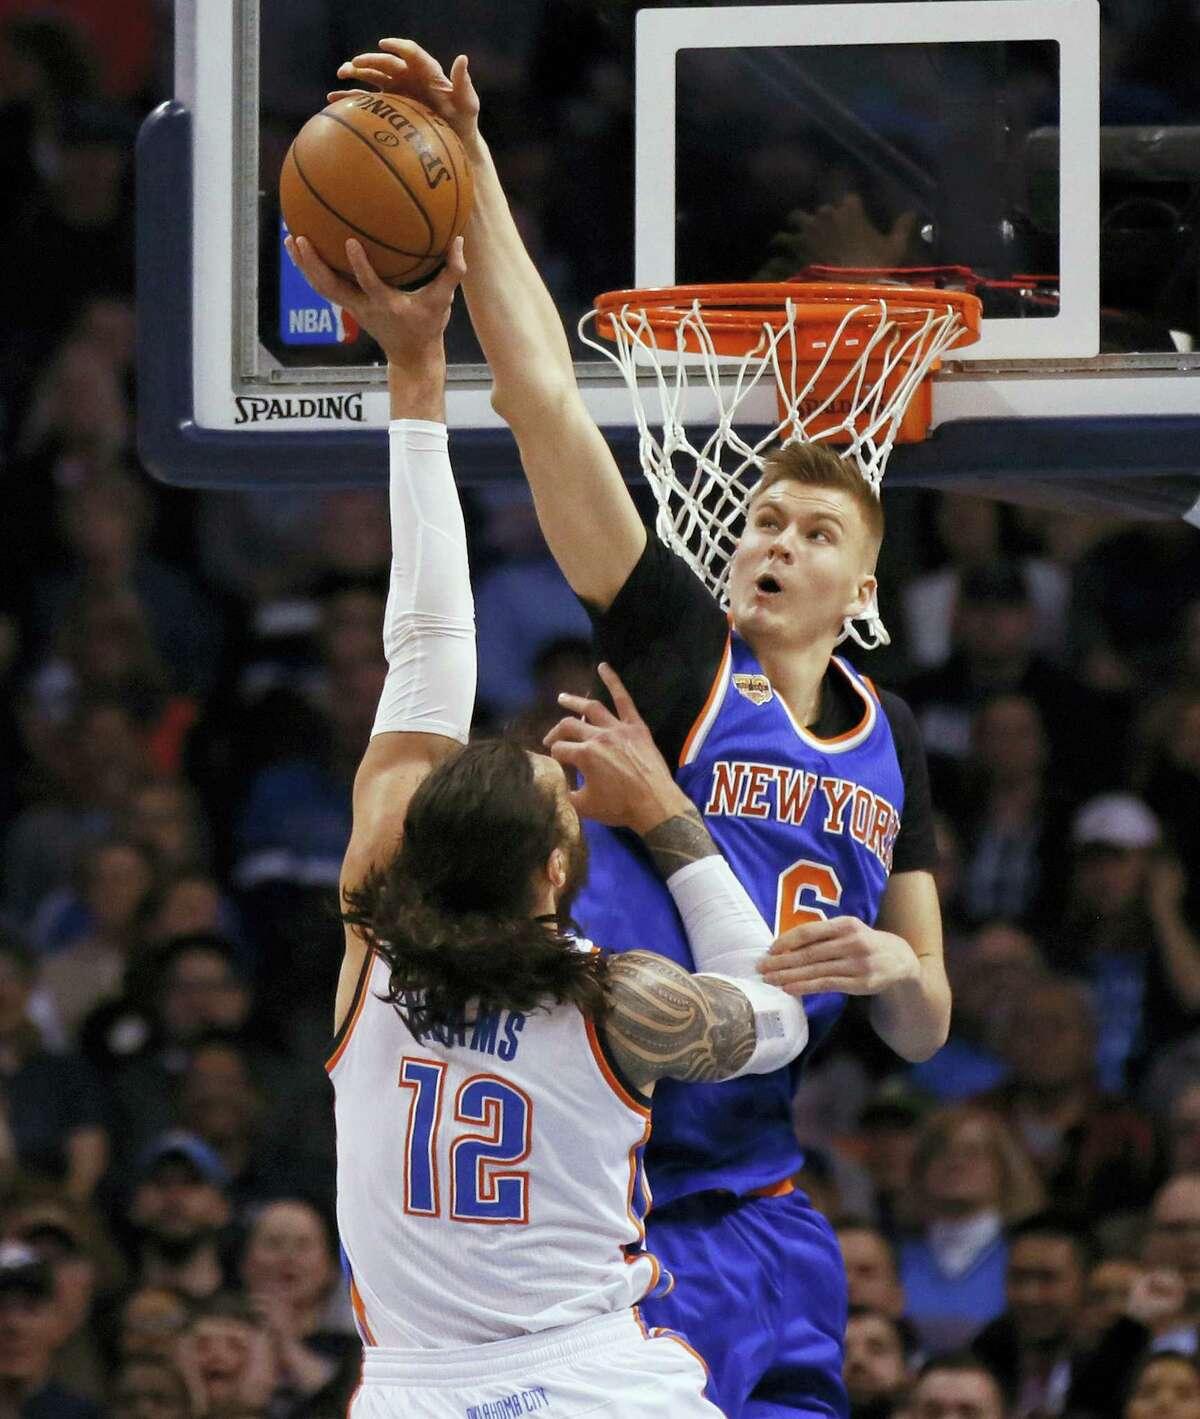 New York Knicks forward Kristaps Porzingis (6) blocks a shot by Oklahoma City Thunder's Steven Adams during the first quarter of an NBA basketball game in Oklahoma City on Feb. 15, 2017.